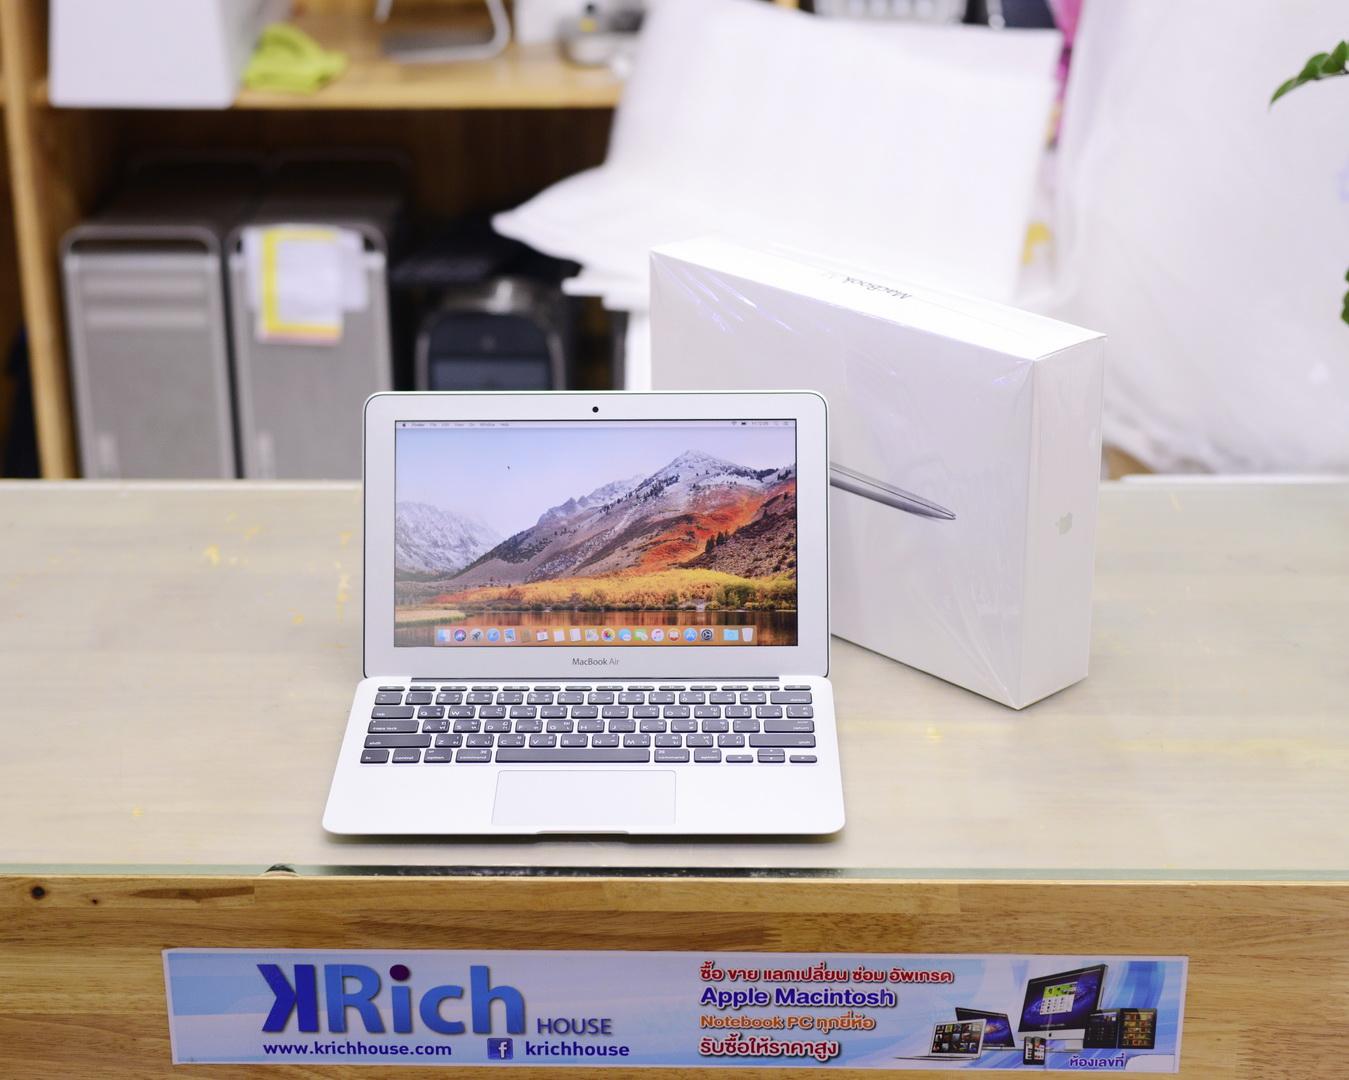 CTO - MacBook Air (11-inch Mid 2013) - Core i5 1.3GHz RAM 8GB SSD 256GB - Fullbox